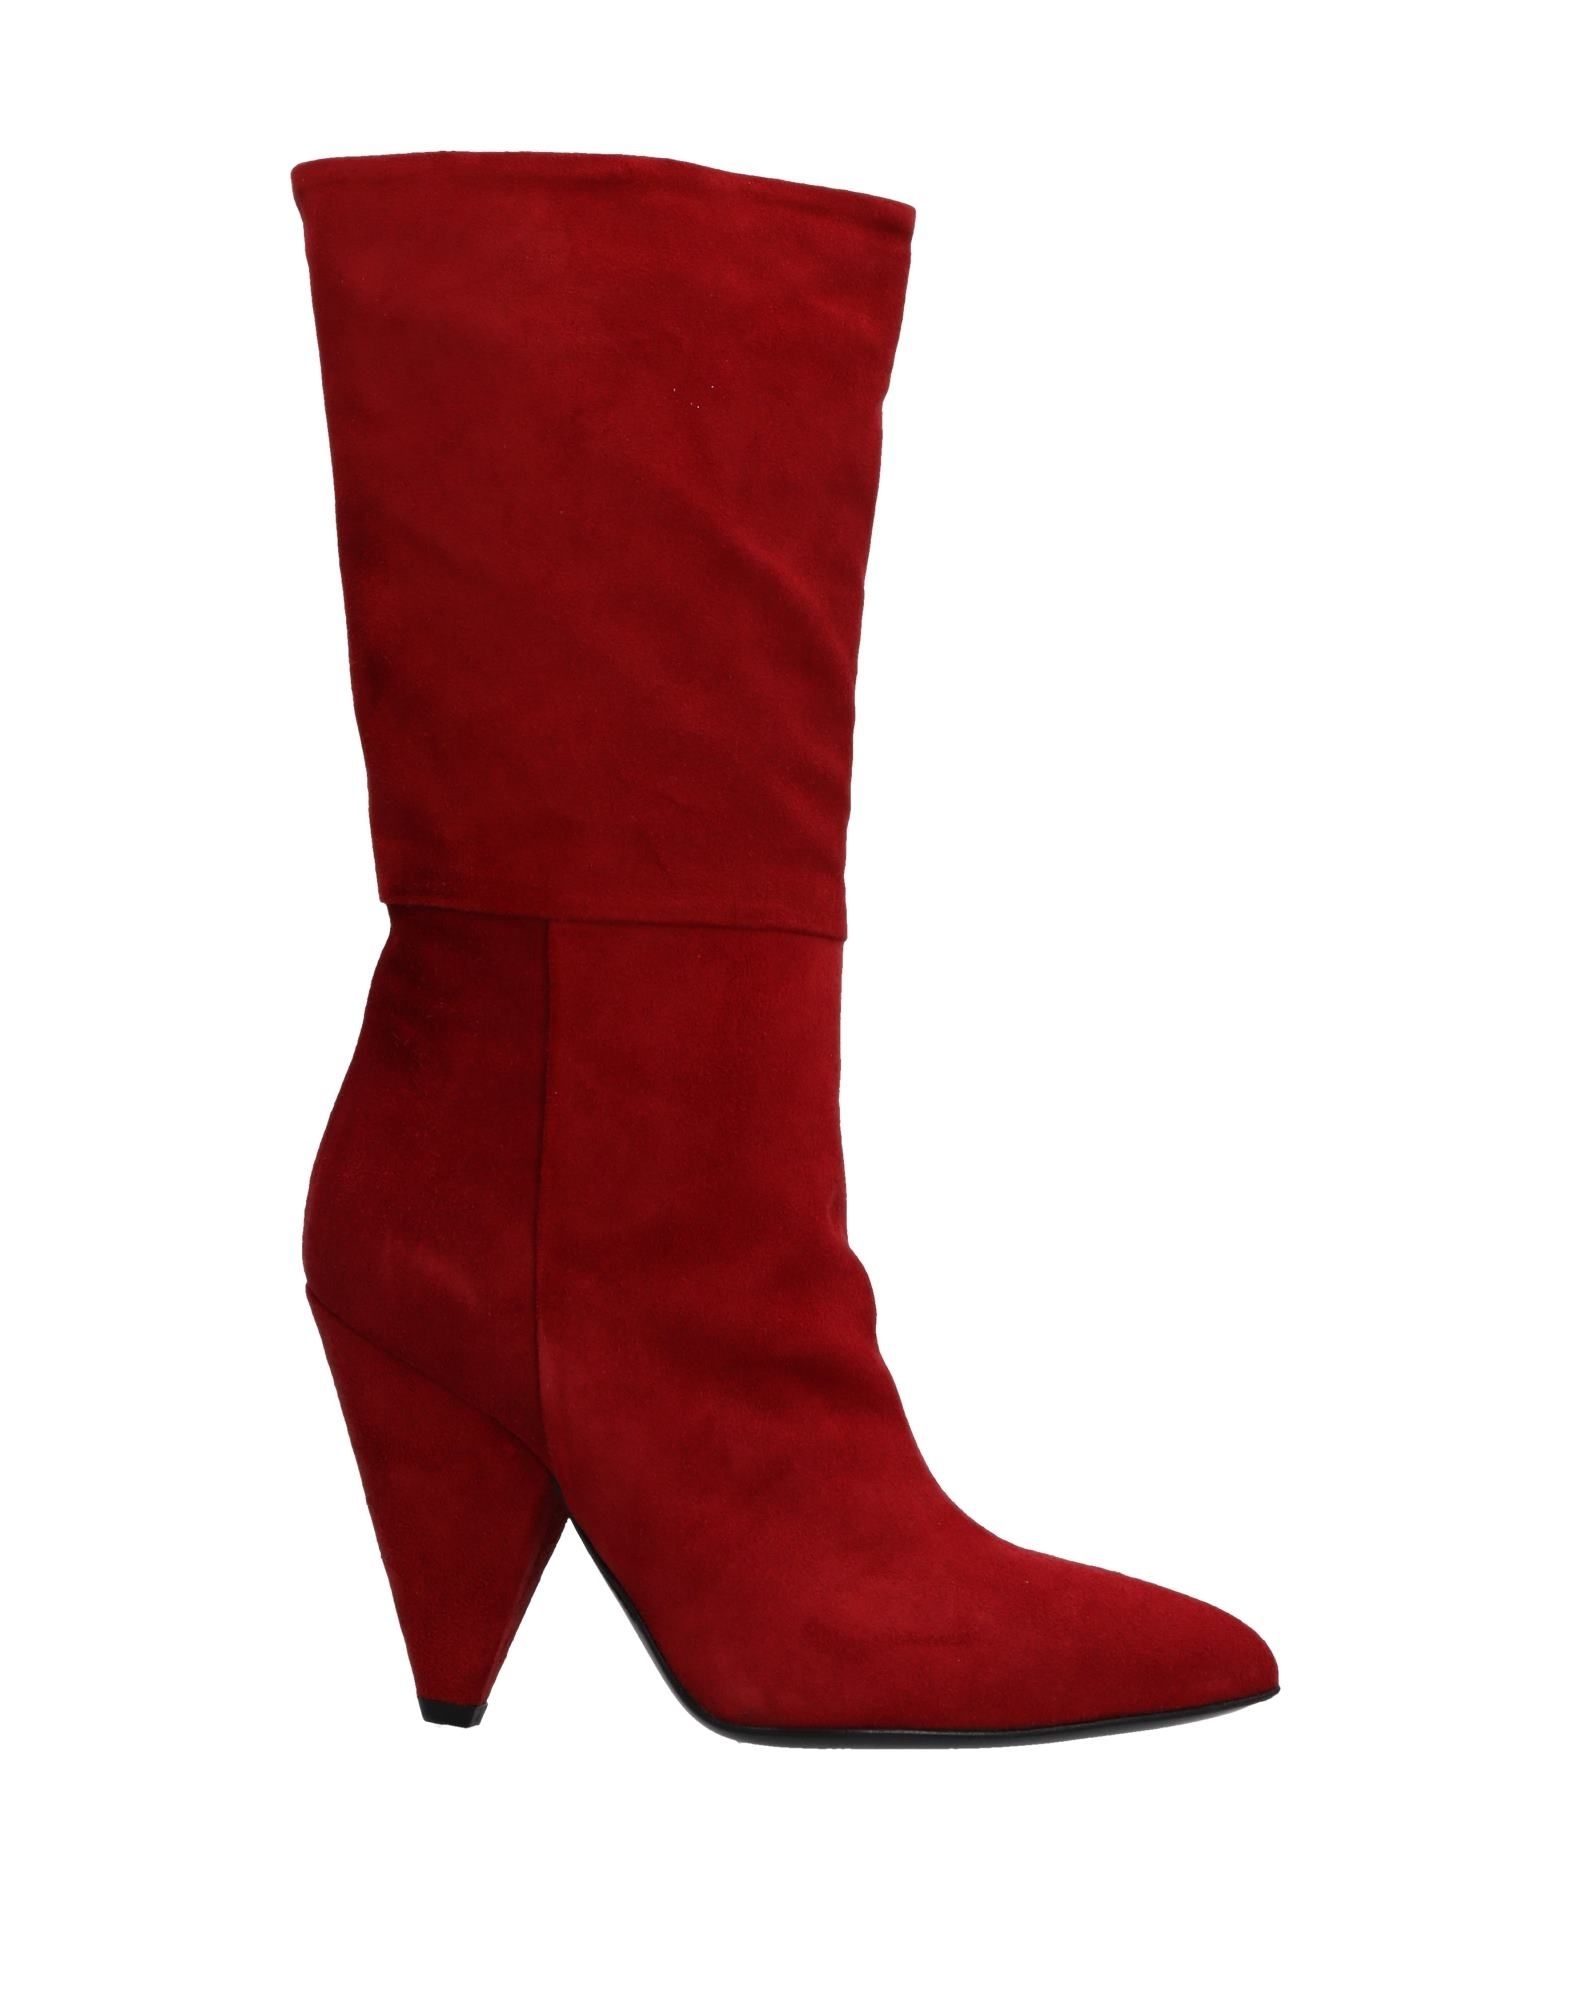 affbda76962a Stilvolle Viozzi billige Schuhe Giampaolo Viozzi Stilvolle Stiefel Damen  11532991SL 2c5f21